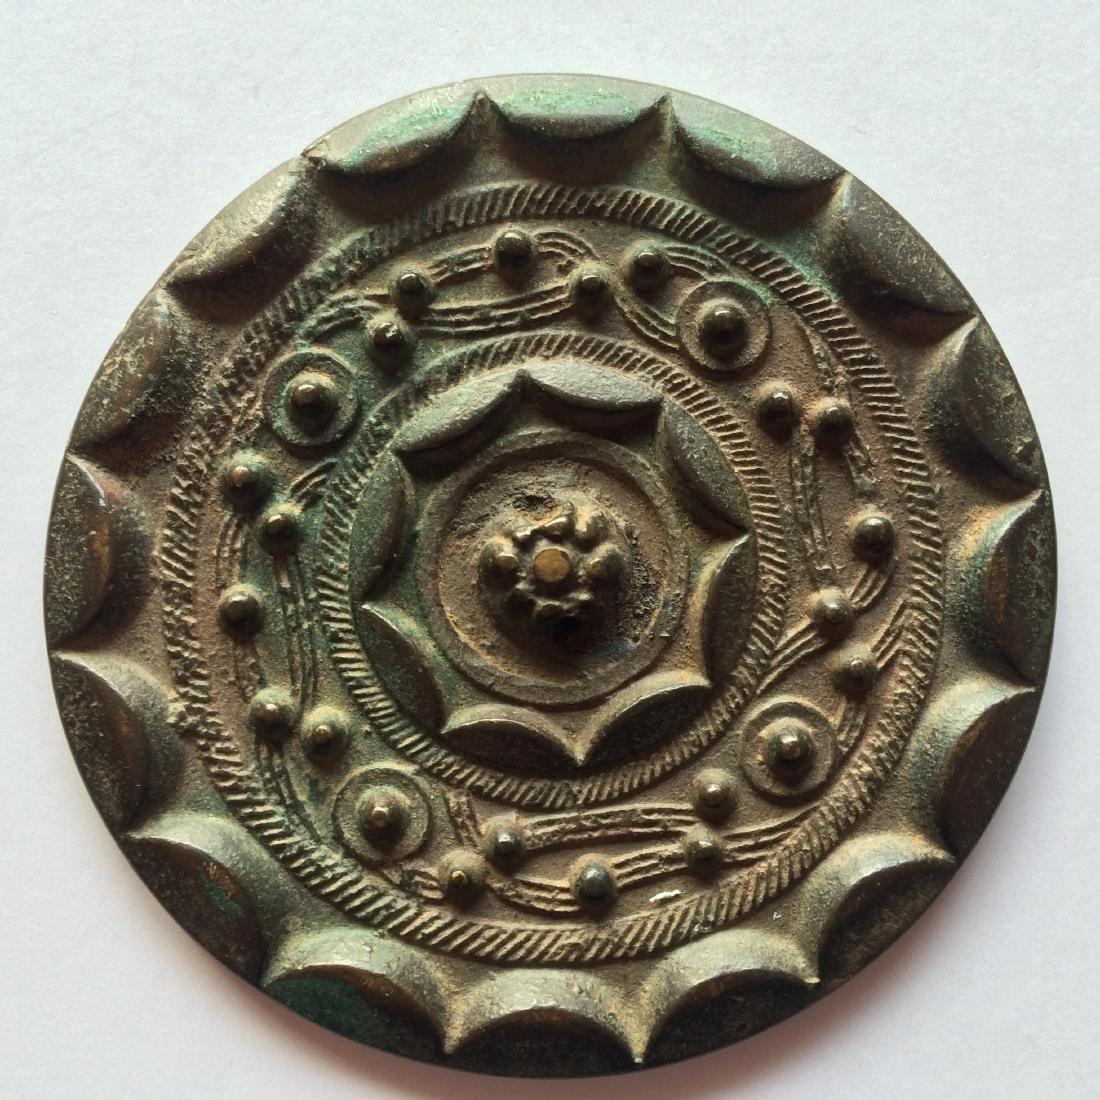 Antique Chinese Bronze Mirror Engraved Design - 5